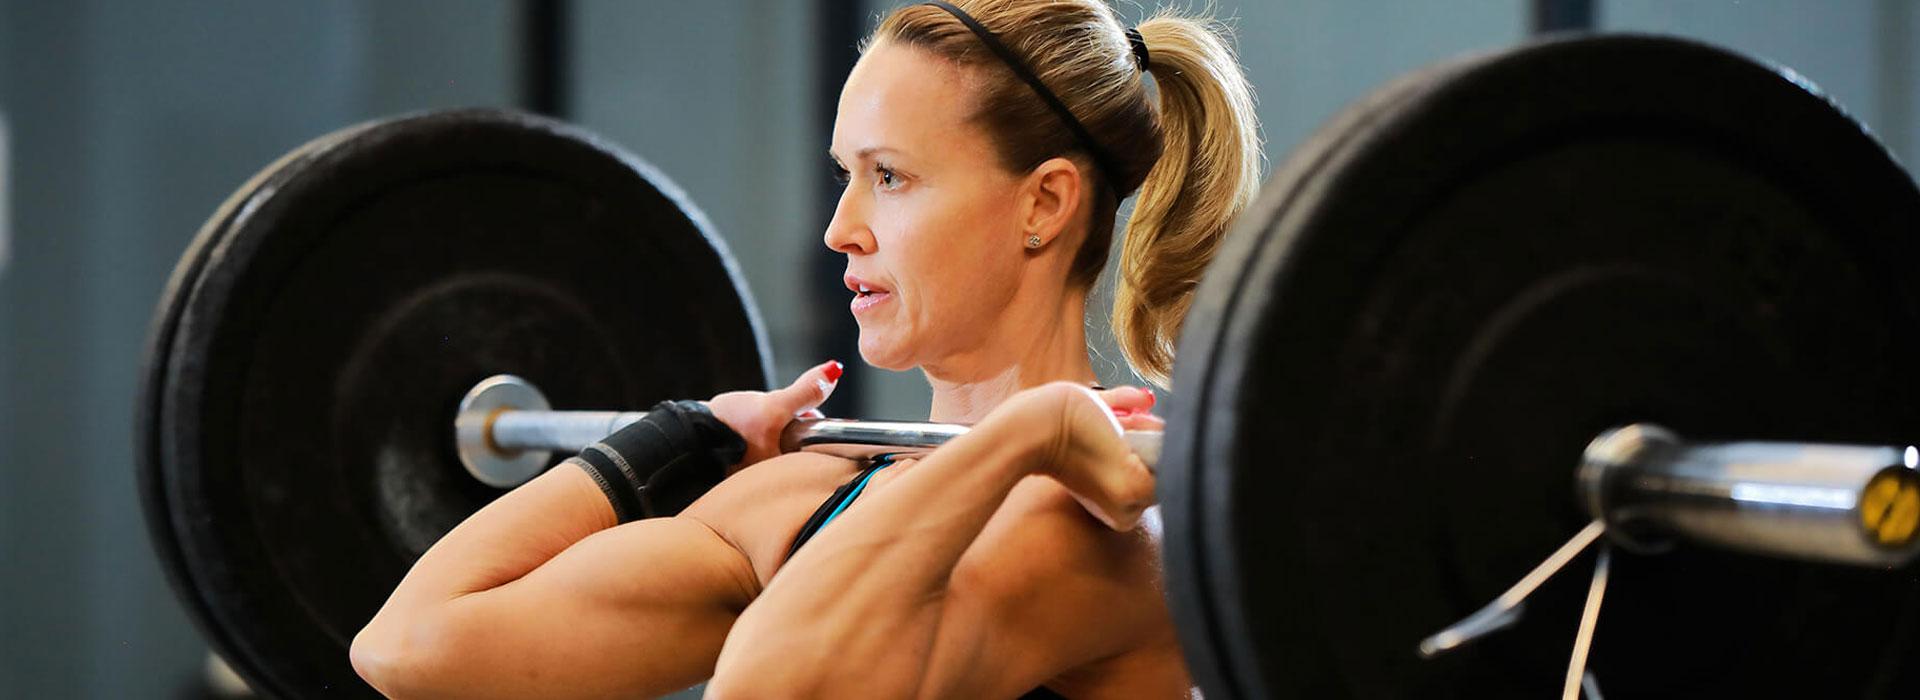 Personal Fitness Training in Sierra Vista AZ, Personal Fitness Training near Nogales AZ, Personal Fitness Training near Green Valley AZ, Personal Fitness Training near Douglas AZ, Personal Fitness Training near Drexel Heights AZ